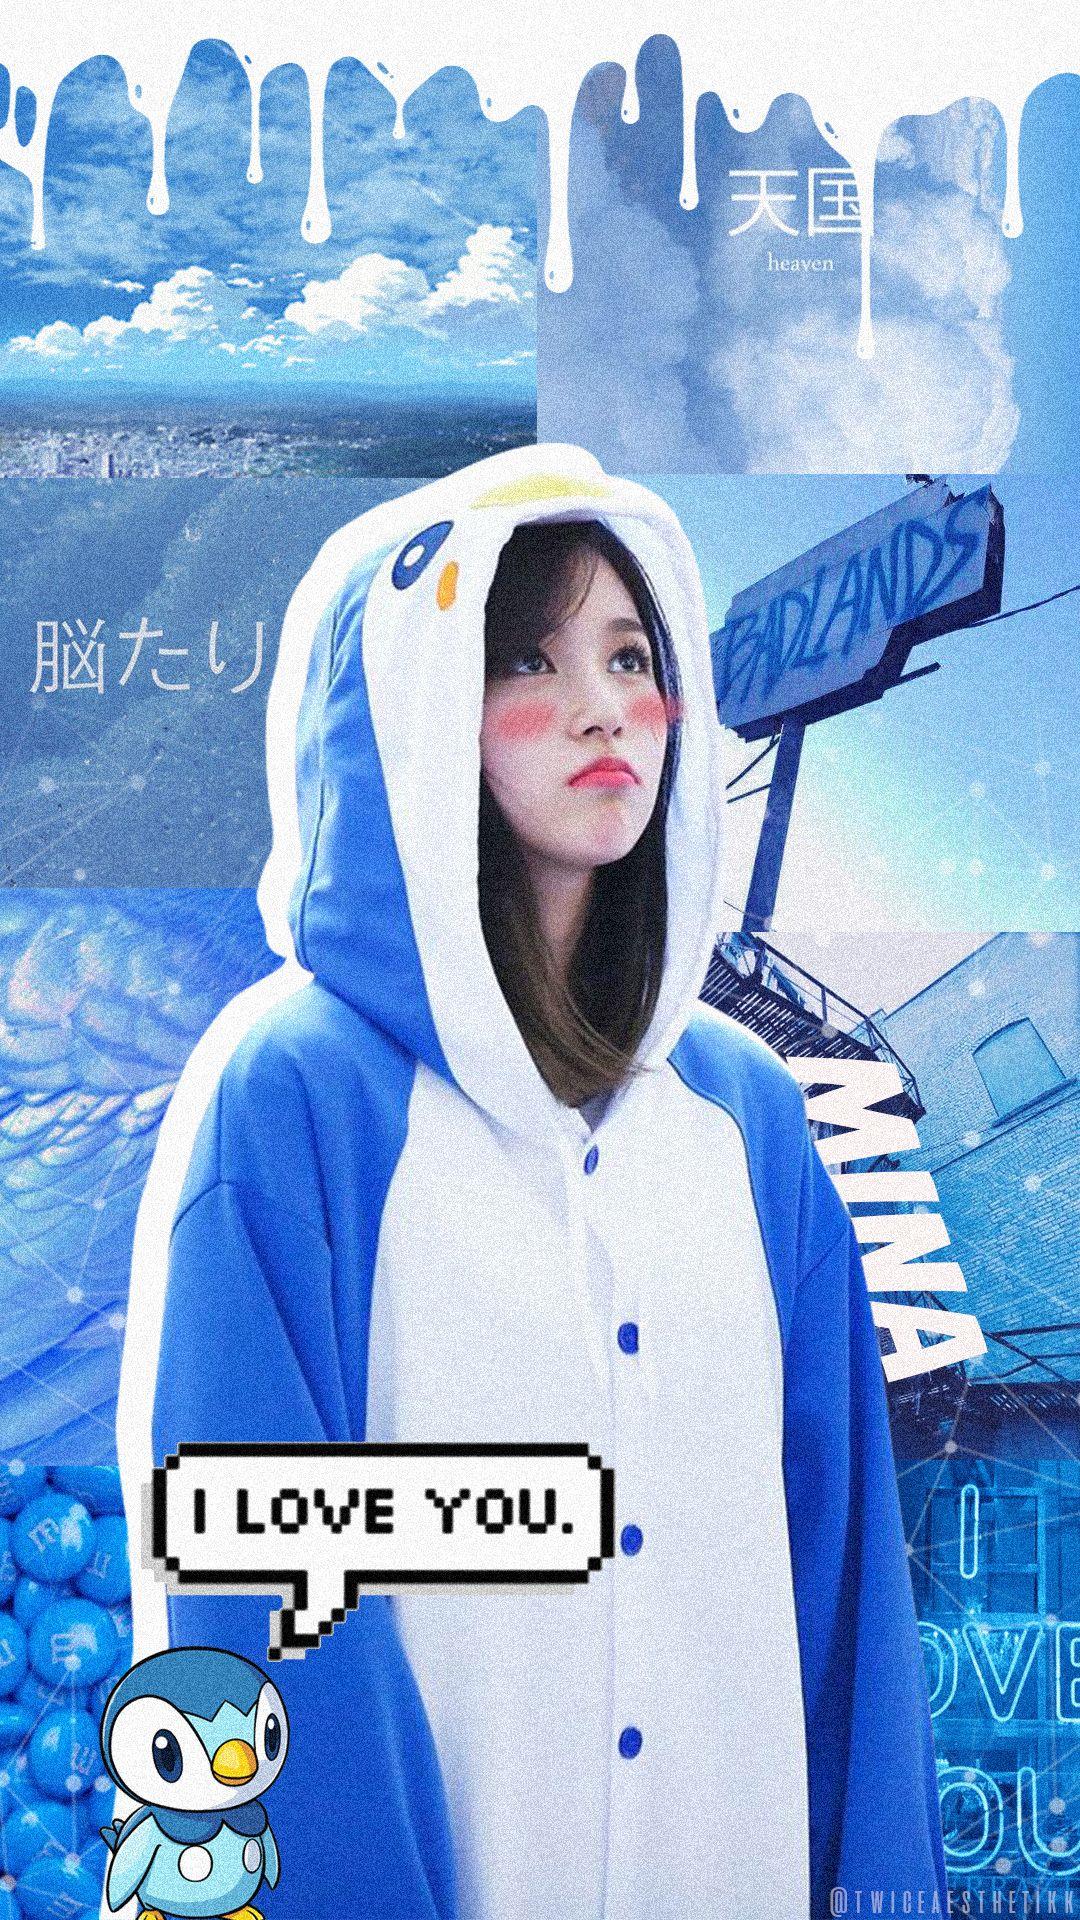 Twice Mina In Penguin Suit Twice Aesthetic Twice Mina Aesthetic Twiceaesthetic Follow Me On Twt Twiceaesthetikk Mina Penguin Wallpaper Penguins